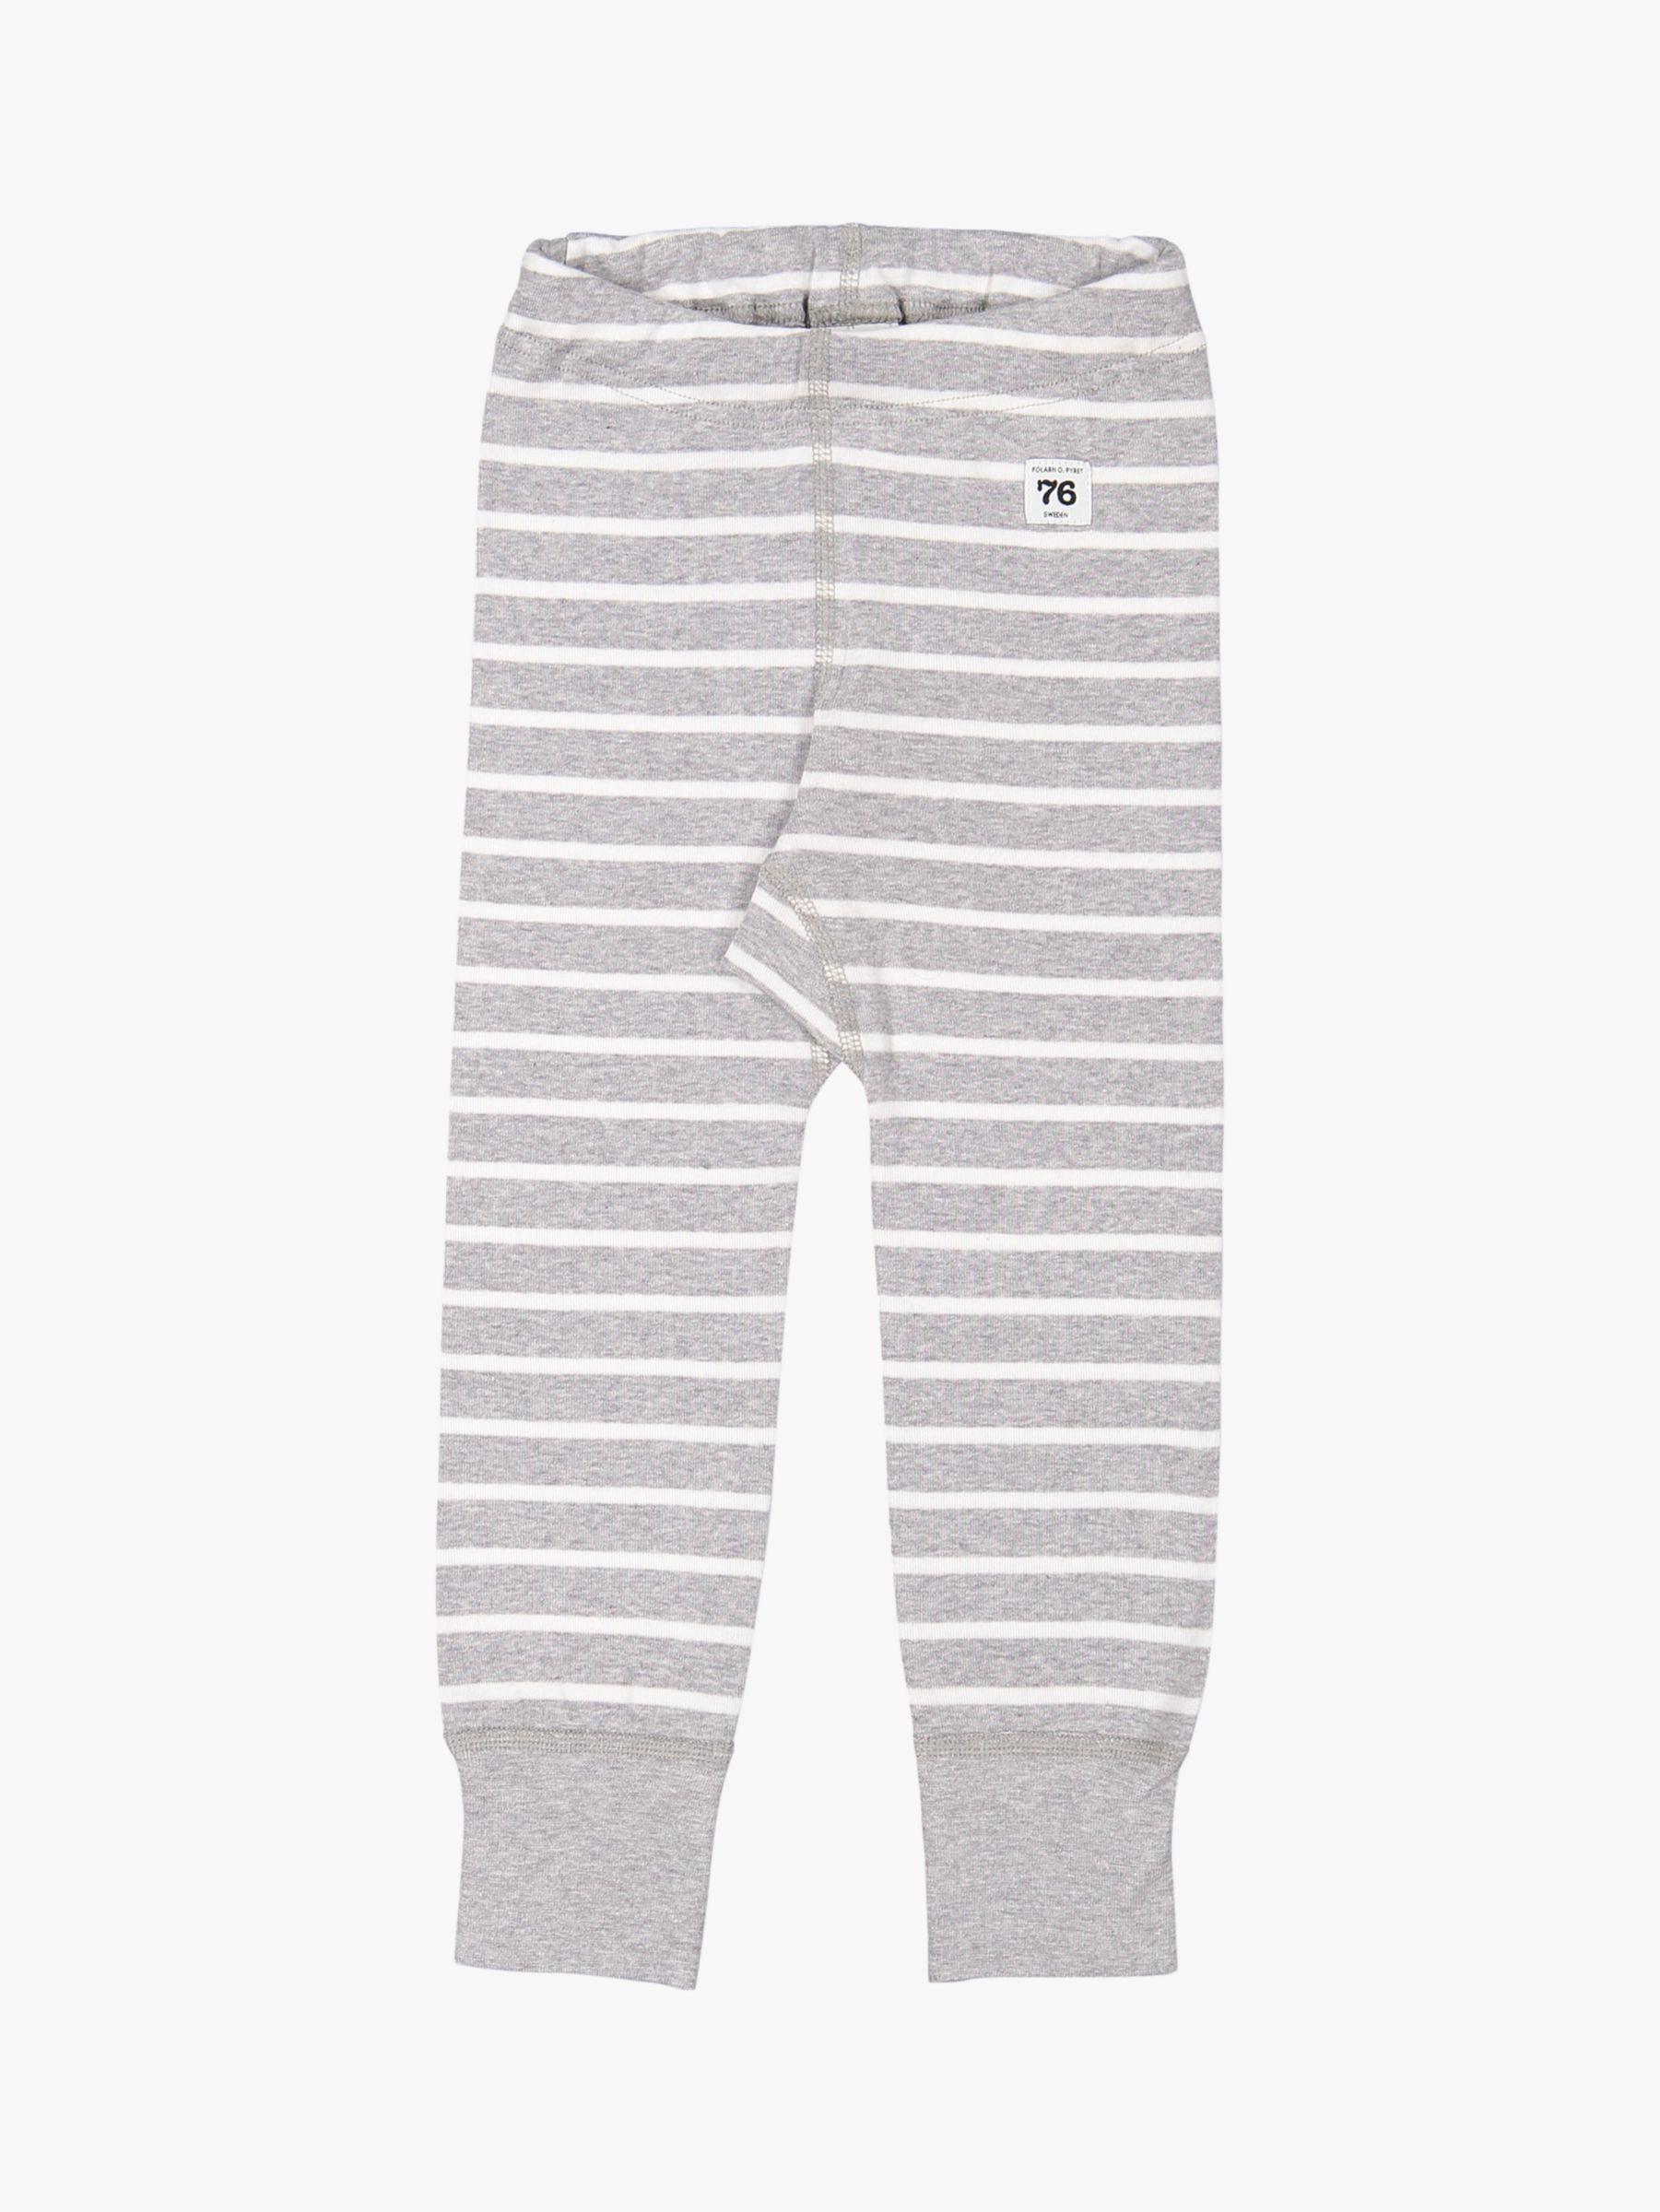 Polarn O. Pyret Polarn O. Pyret Children's GOTS Organic Cotton Stripe Leggings, Grey